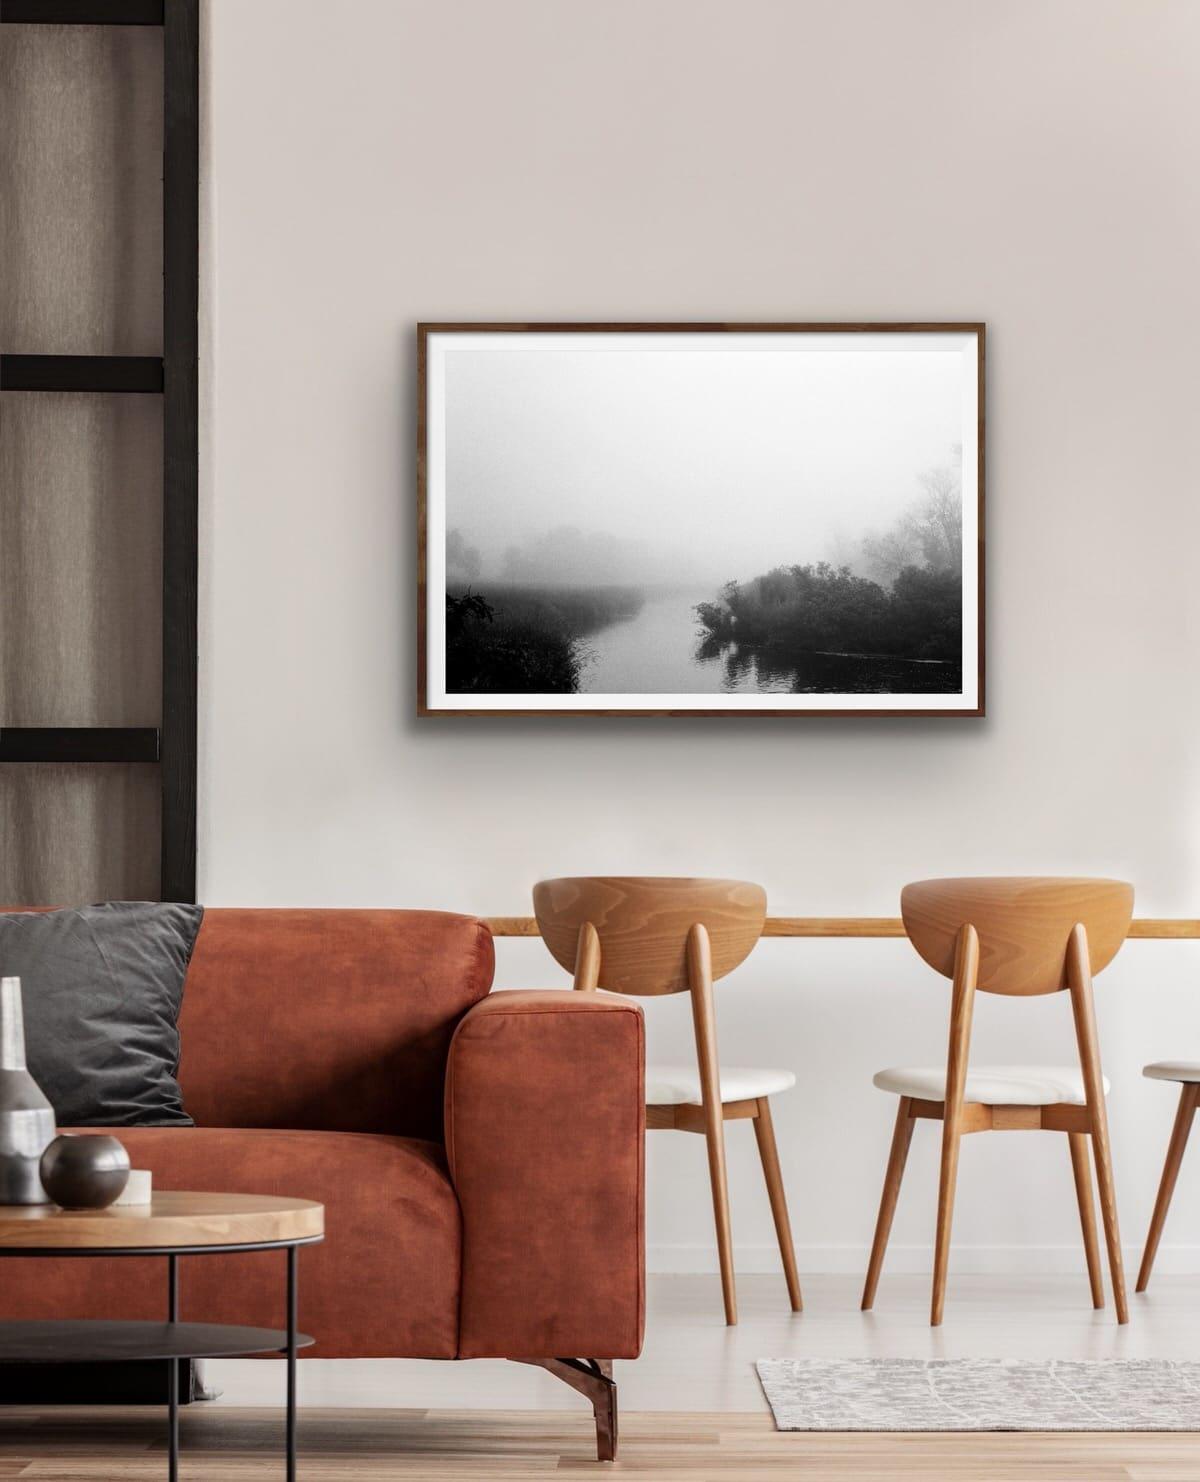 Black-and-white-fine-art-film-photography-wall-decor-by-emerging-artist-Studio-L-photographer-Laura-Schneider-_4706